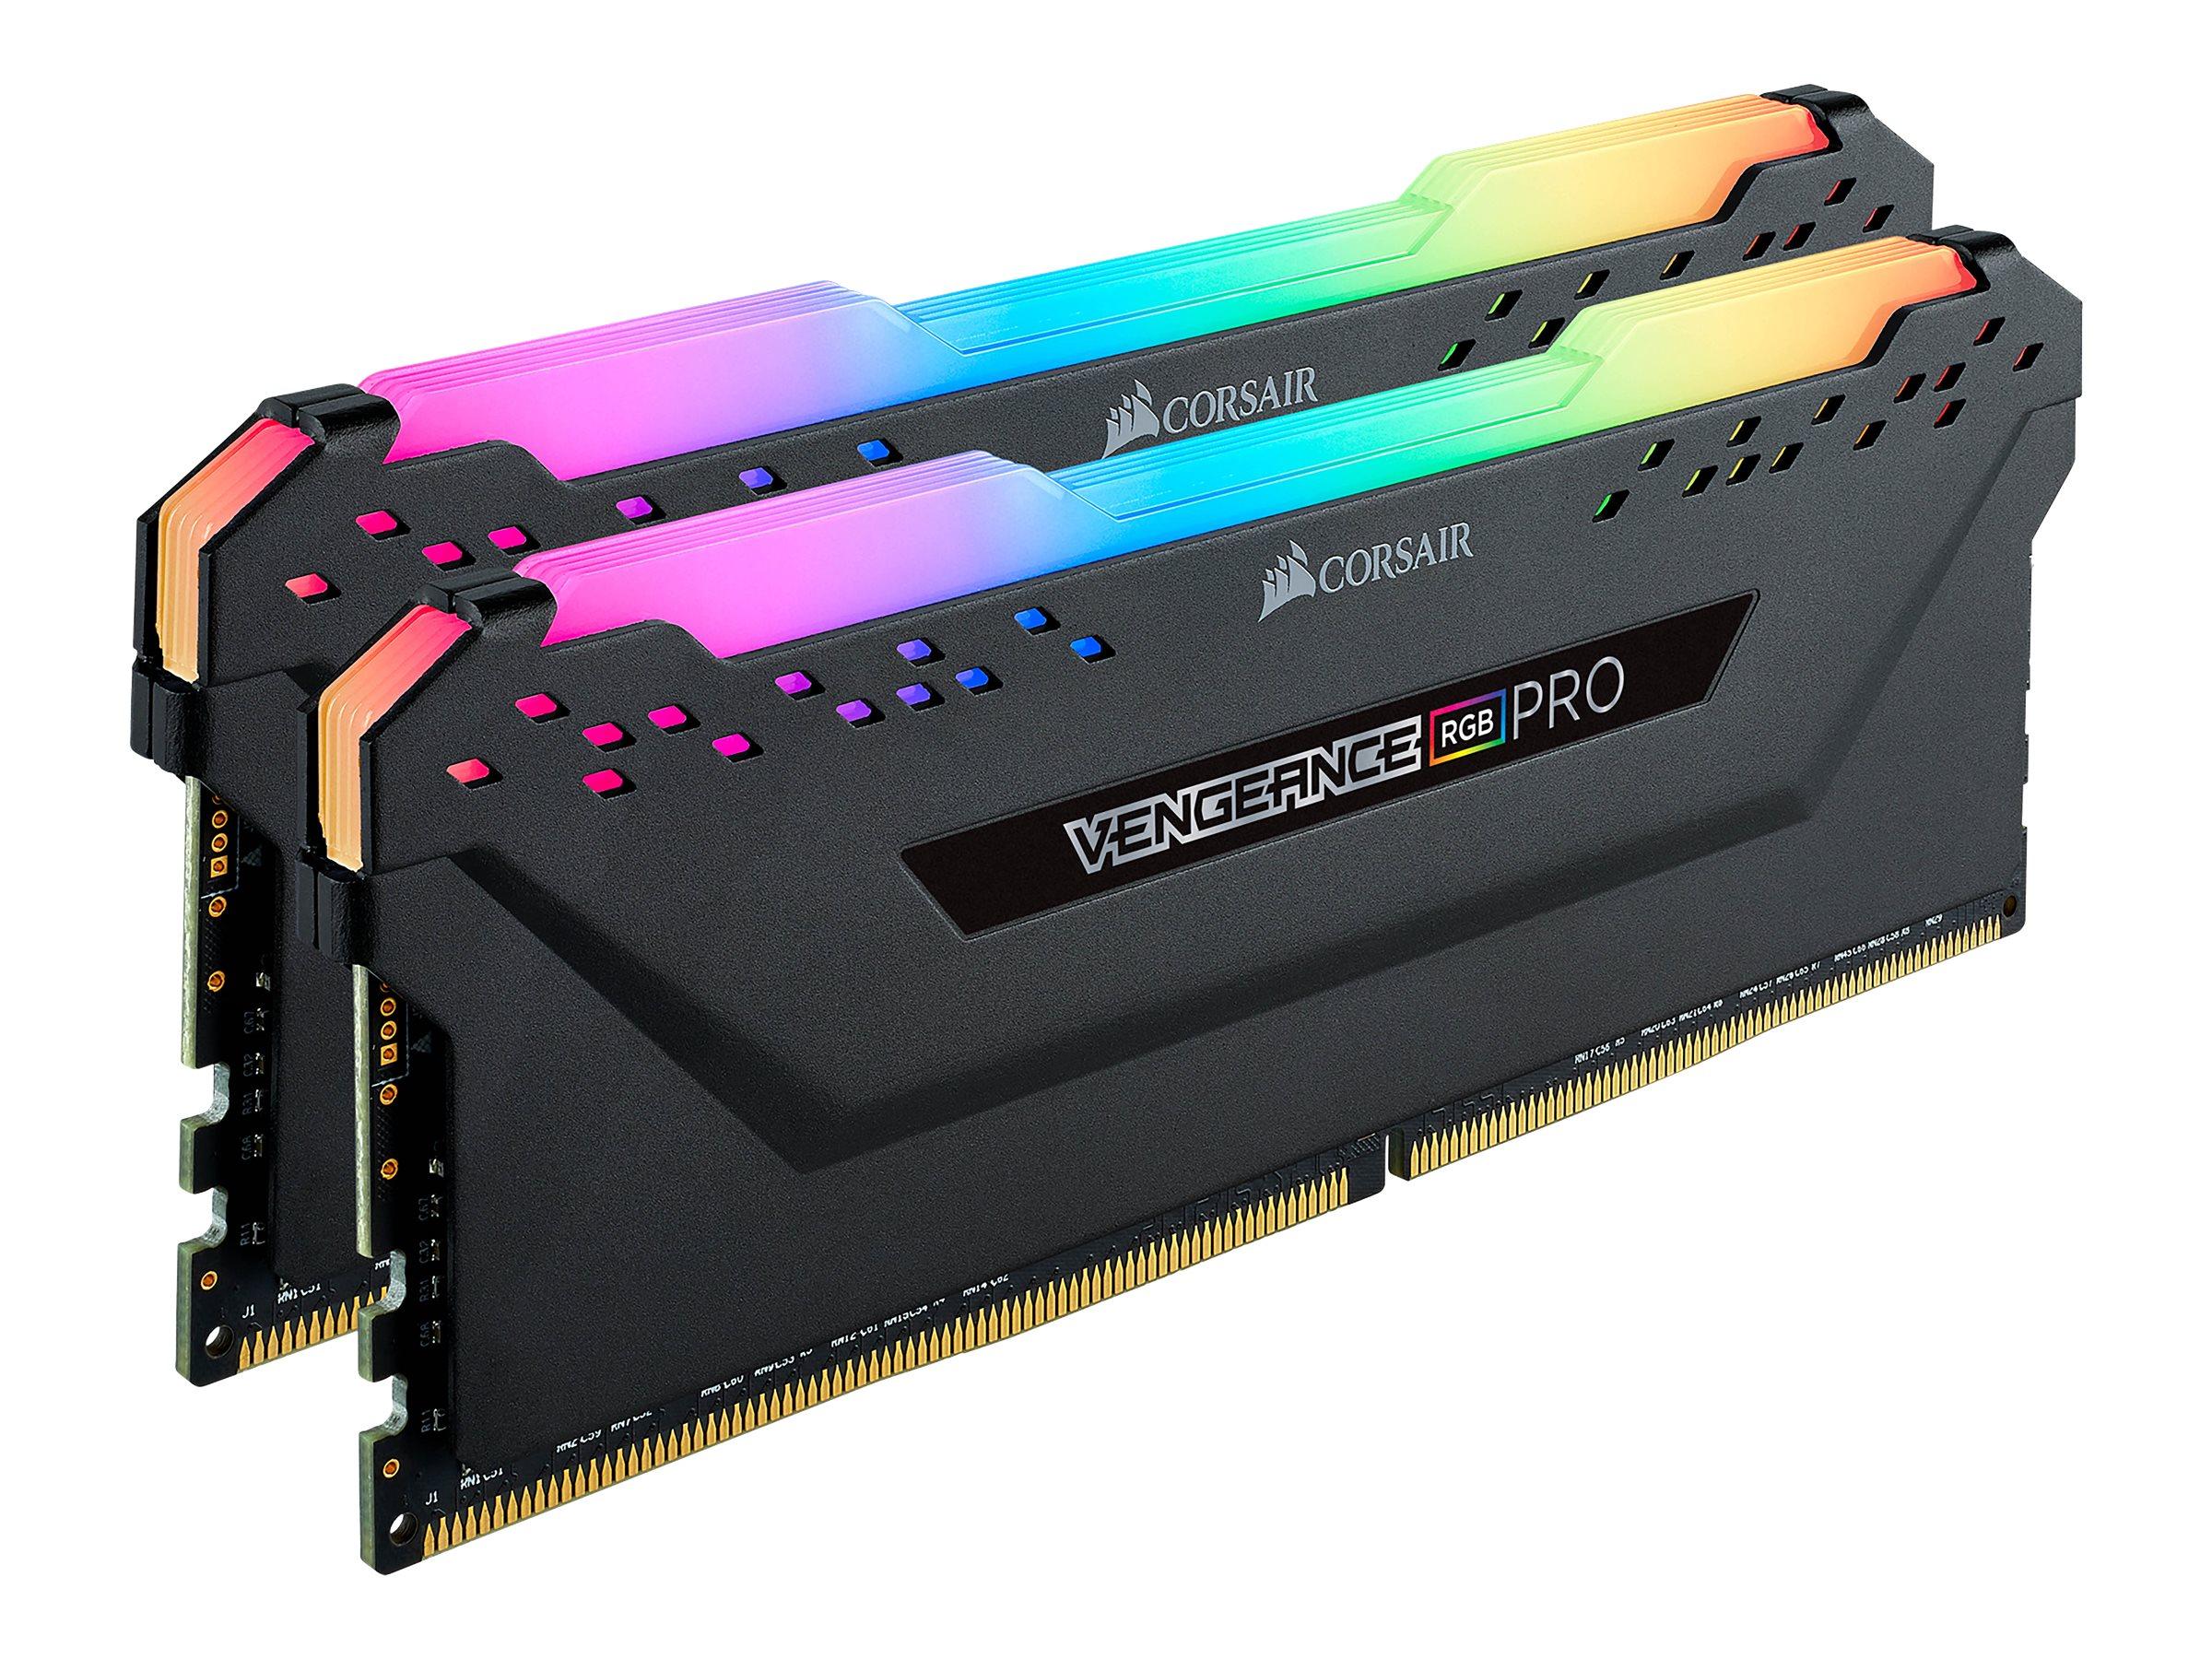 Corsair Vengeance RGB PRO - DDR4 - 32 GB: 2 x 16 GB DIMM 288-PIN - 2666 MHz / PC4-21300 - CL16 - 1.2 V - ungepuffert - non-ECC - Schwarz